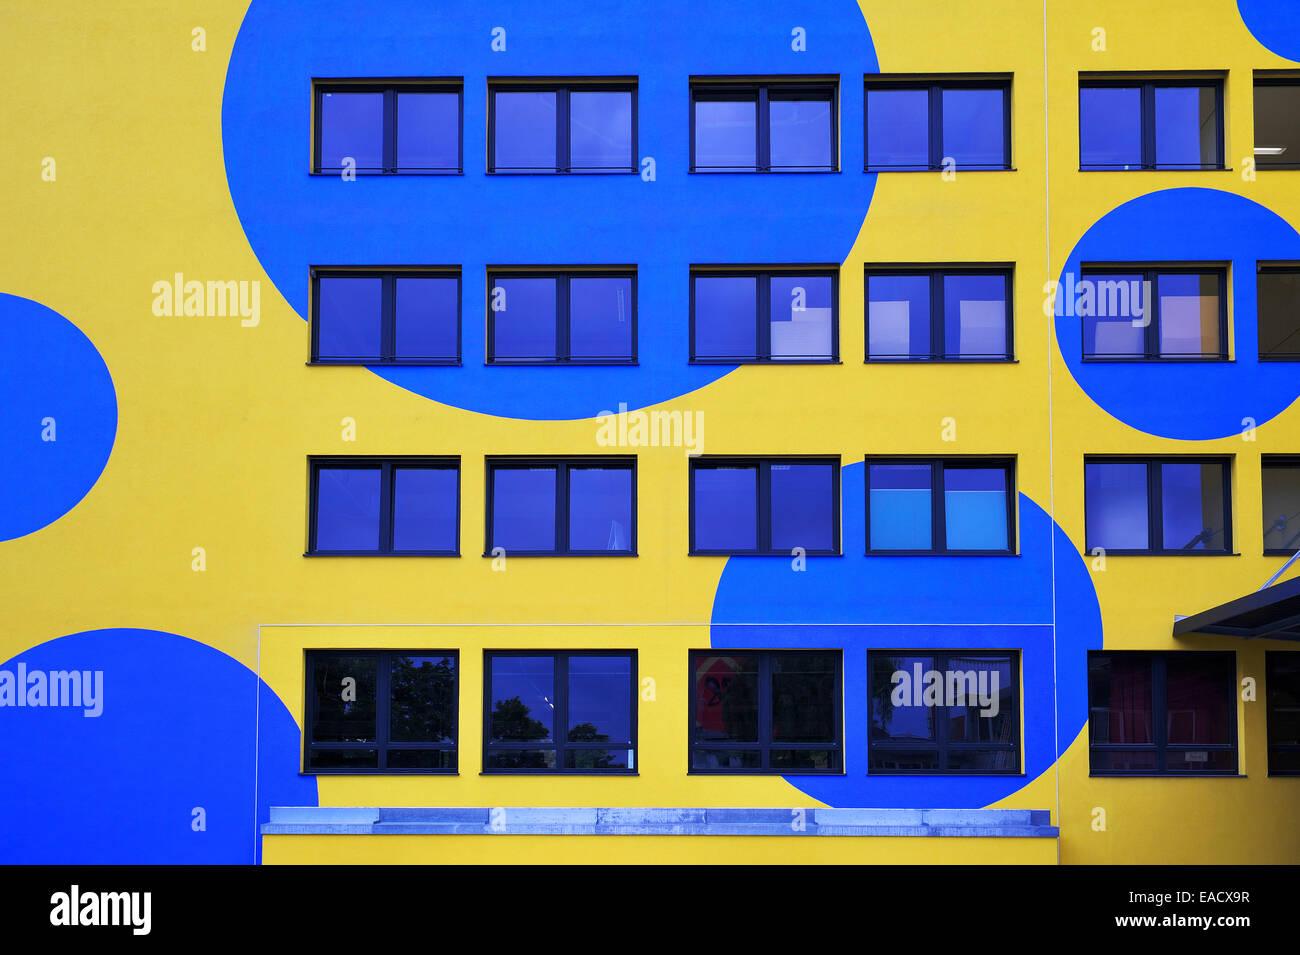 Kistler Hof, Das Kreative Areal, a redevelopment site for creative industries, Munich, Upper Bavaria, Bavaria, Germany - Stock Image